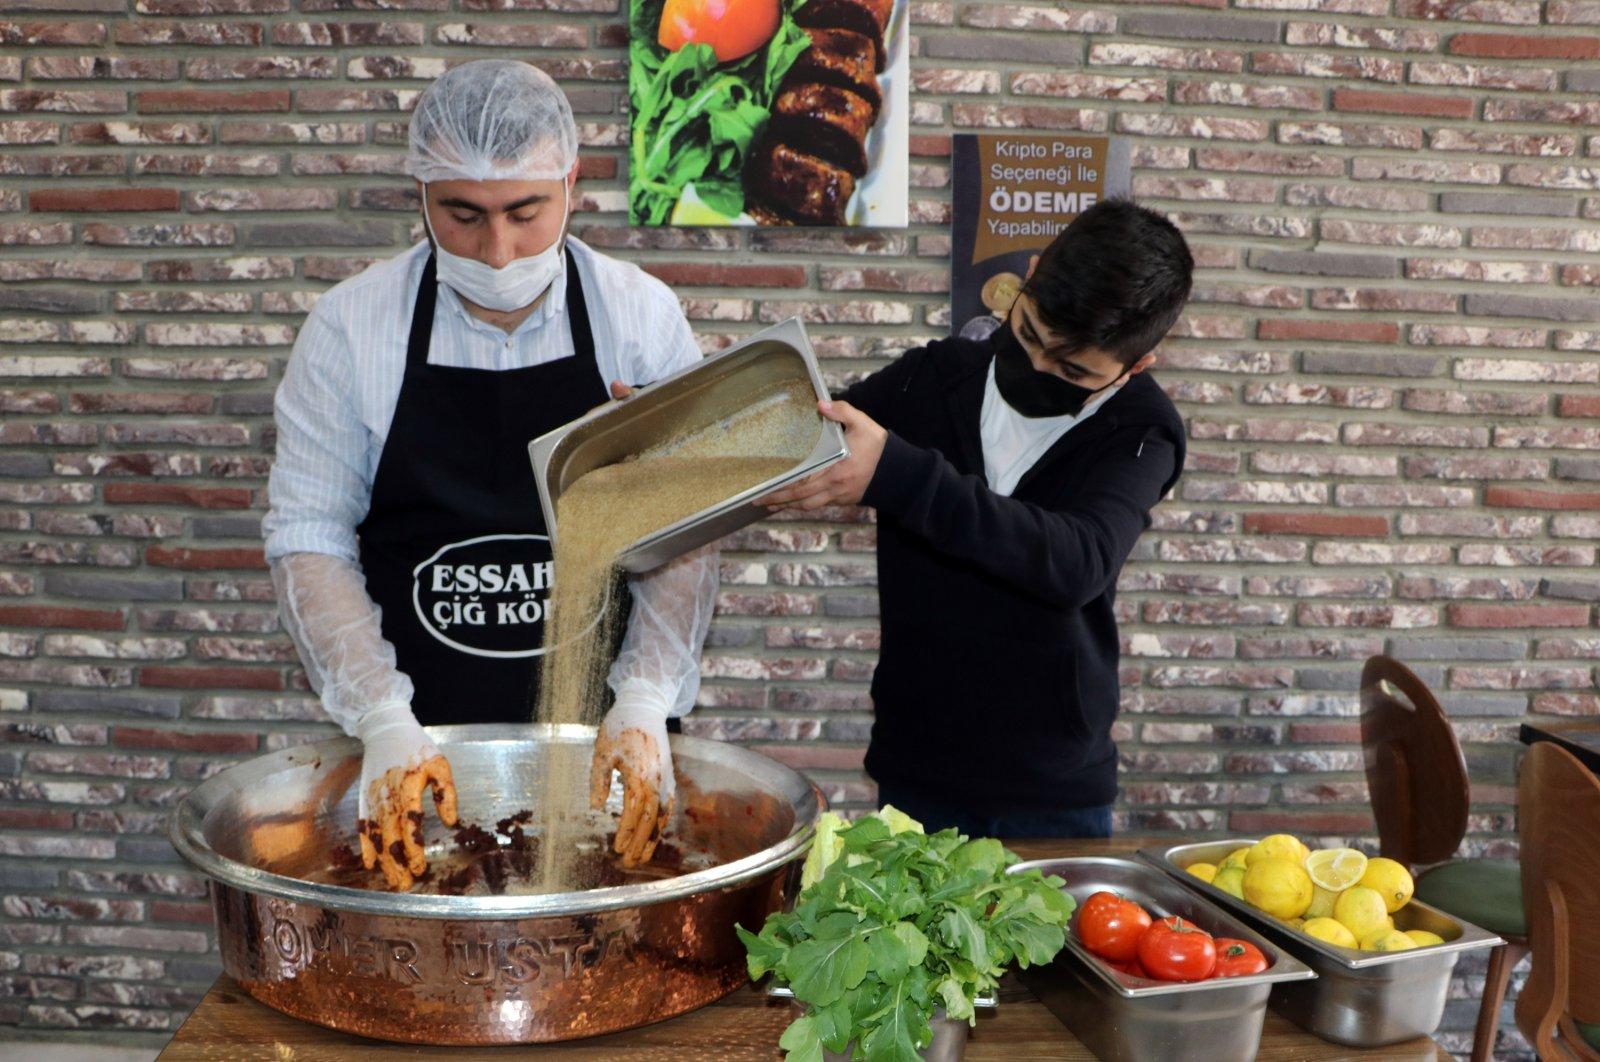 Ömer Güler making çiğ köfte in his restaurant in Turkey's Adana province, southern Turkey, March 29, 2021. (DHA Photo)